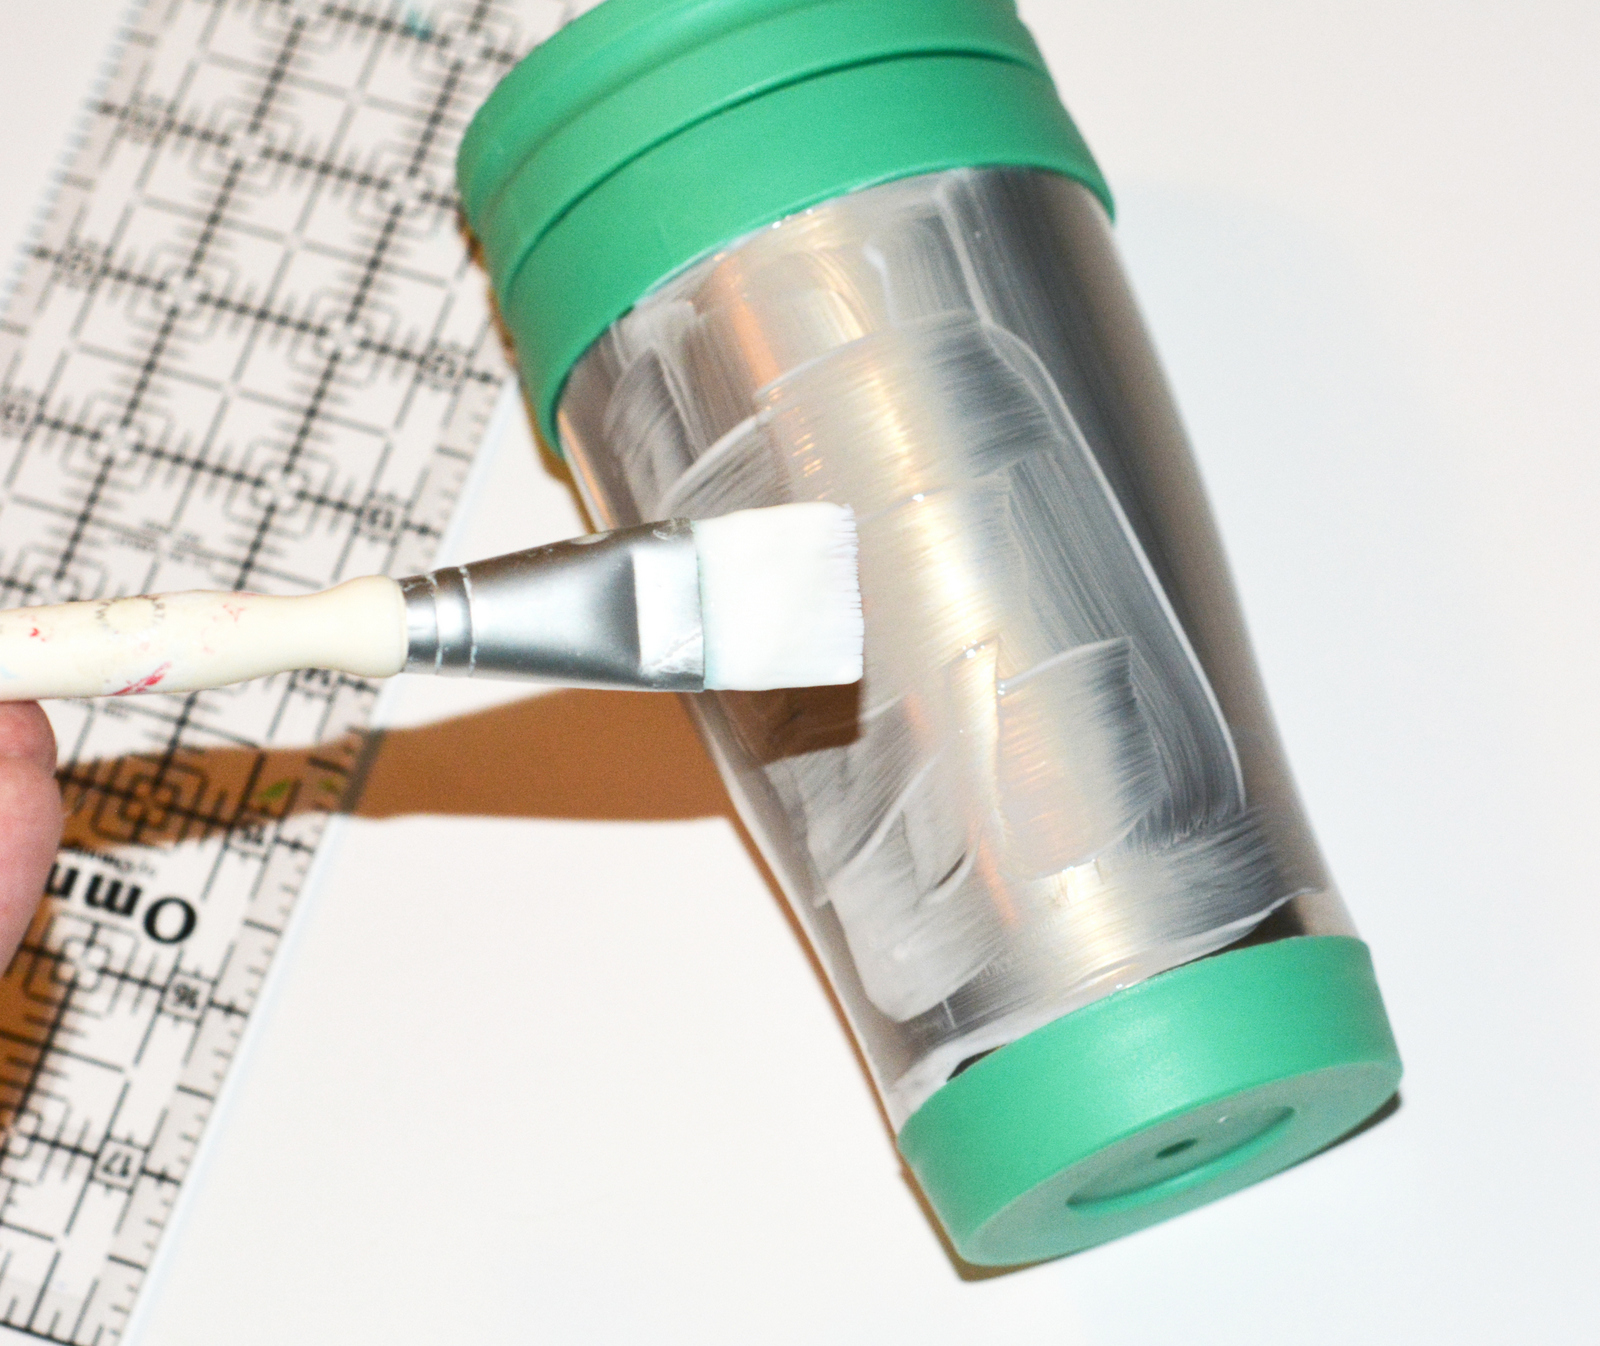 Painting Mod Podge Dishwasher Safe onto the side of a travel mug with a paintbrush